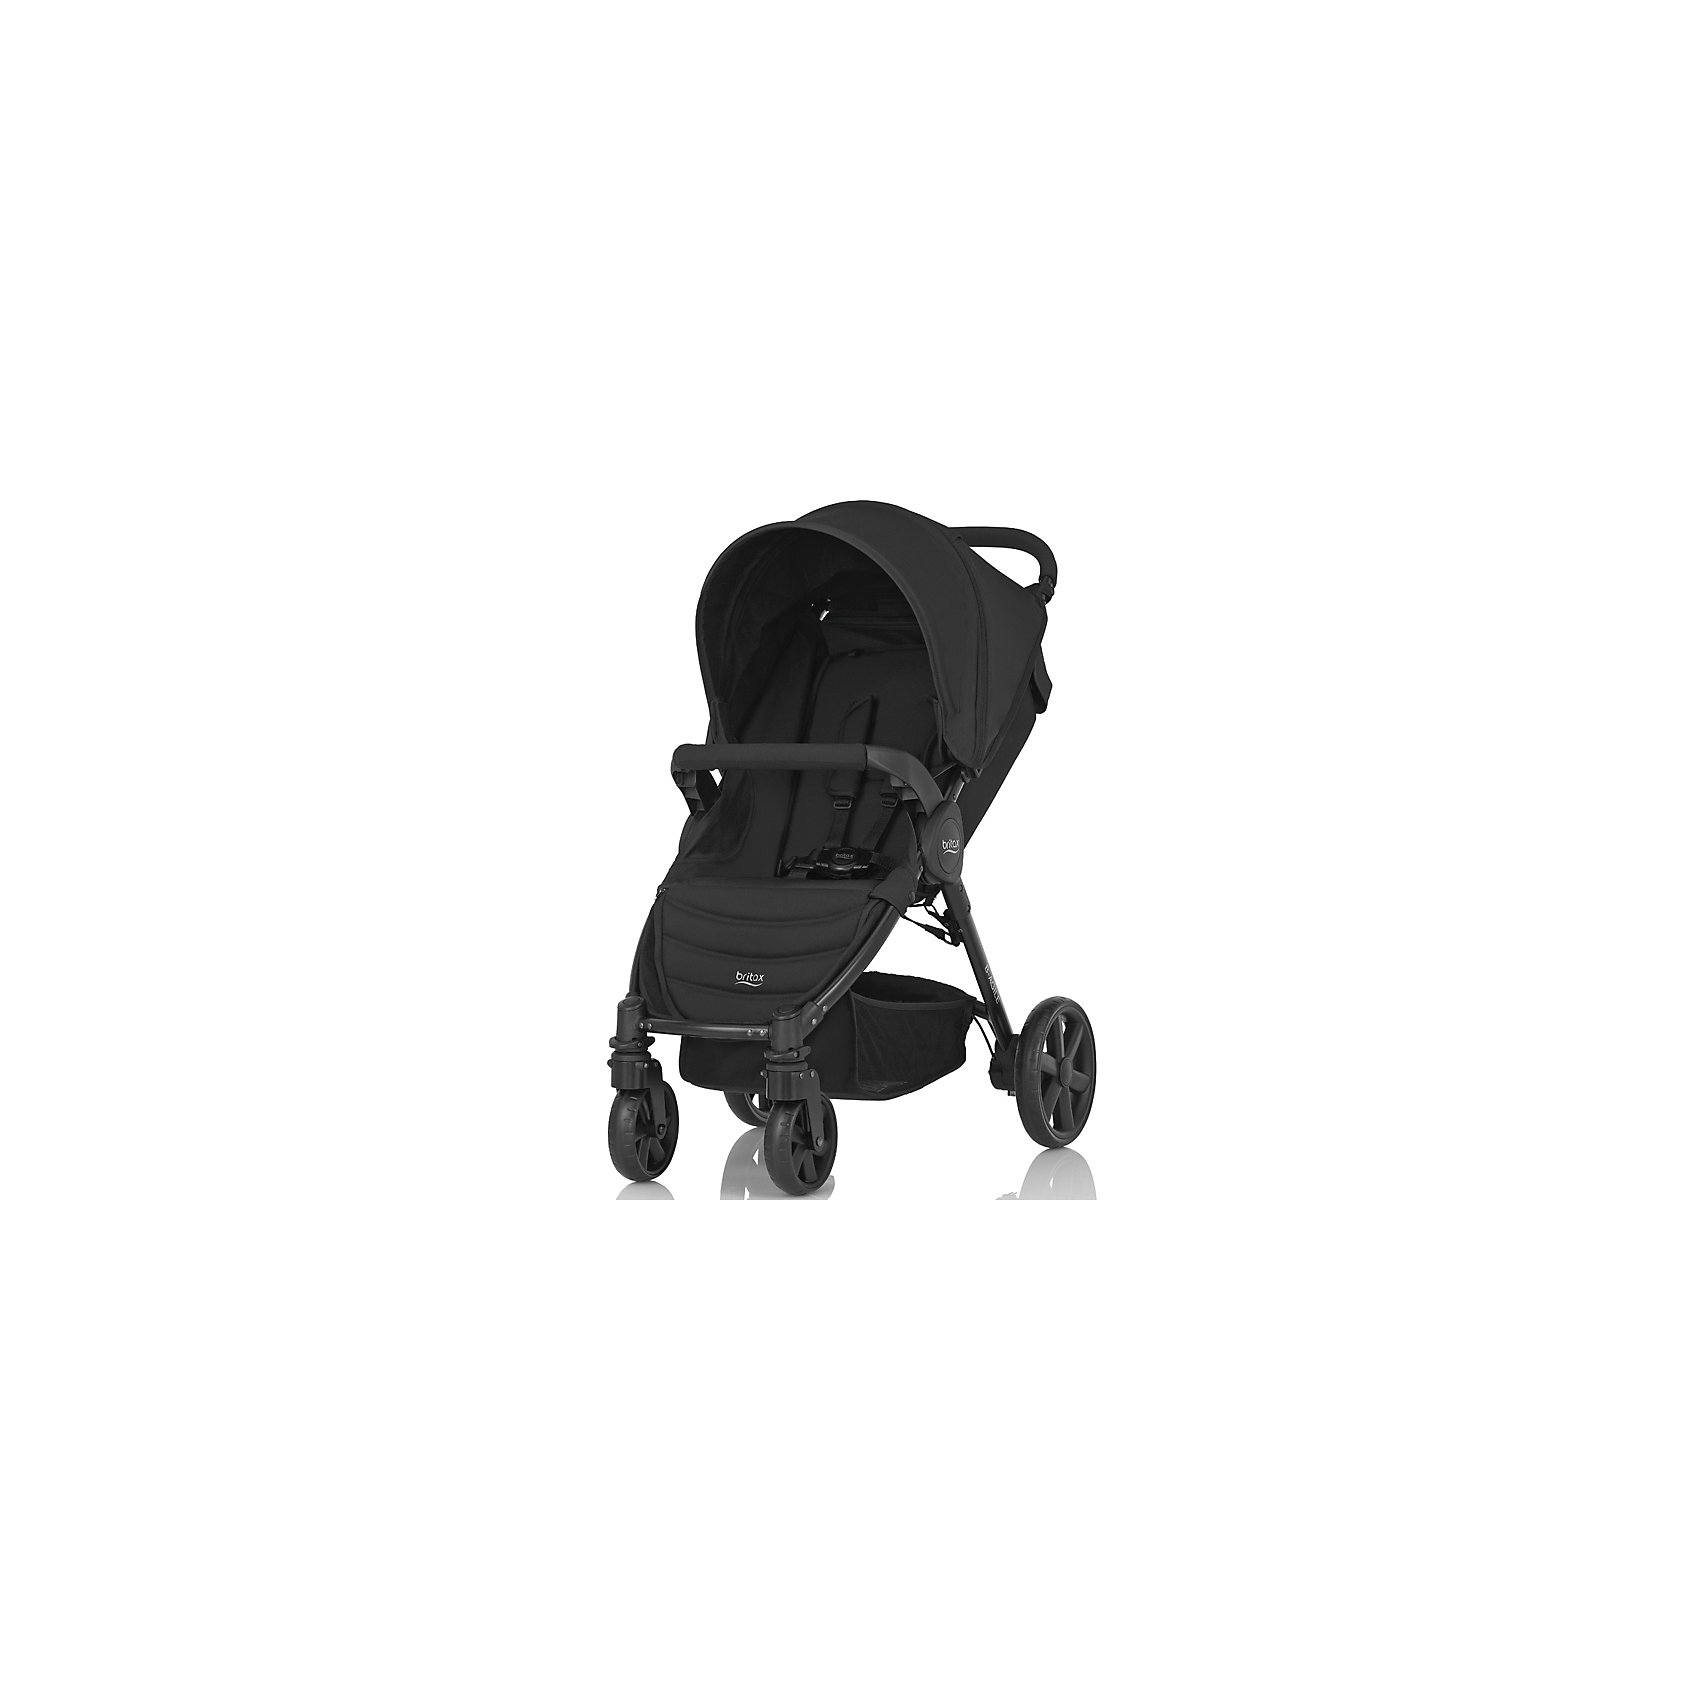 Прогулочная коляска Britax B-Agile 4, Cosmos Black